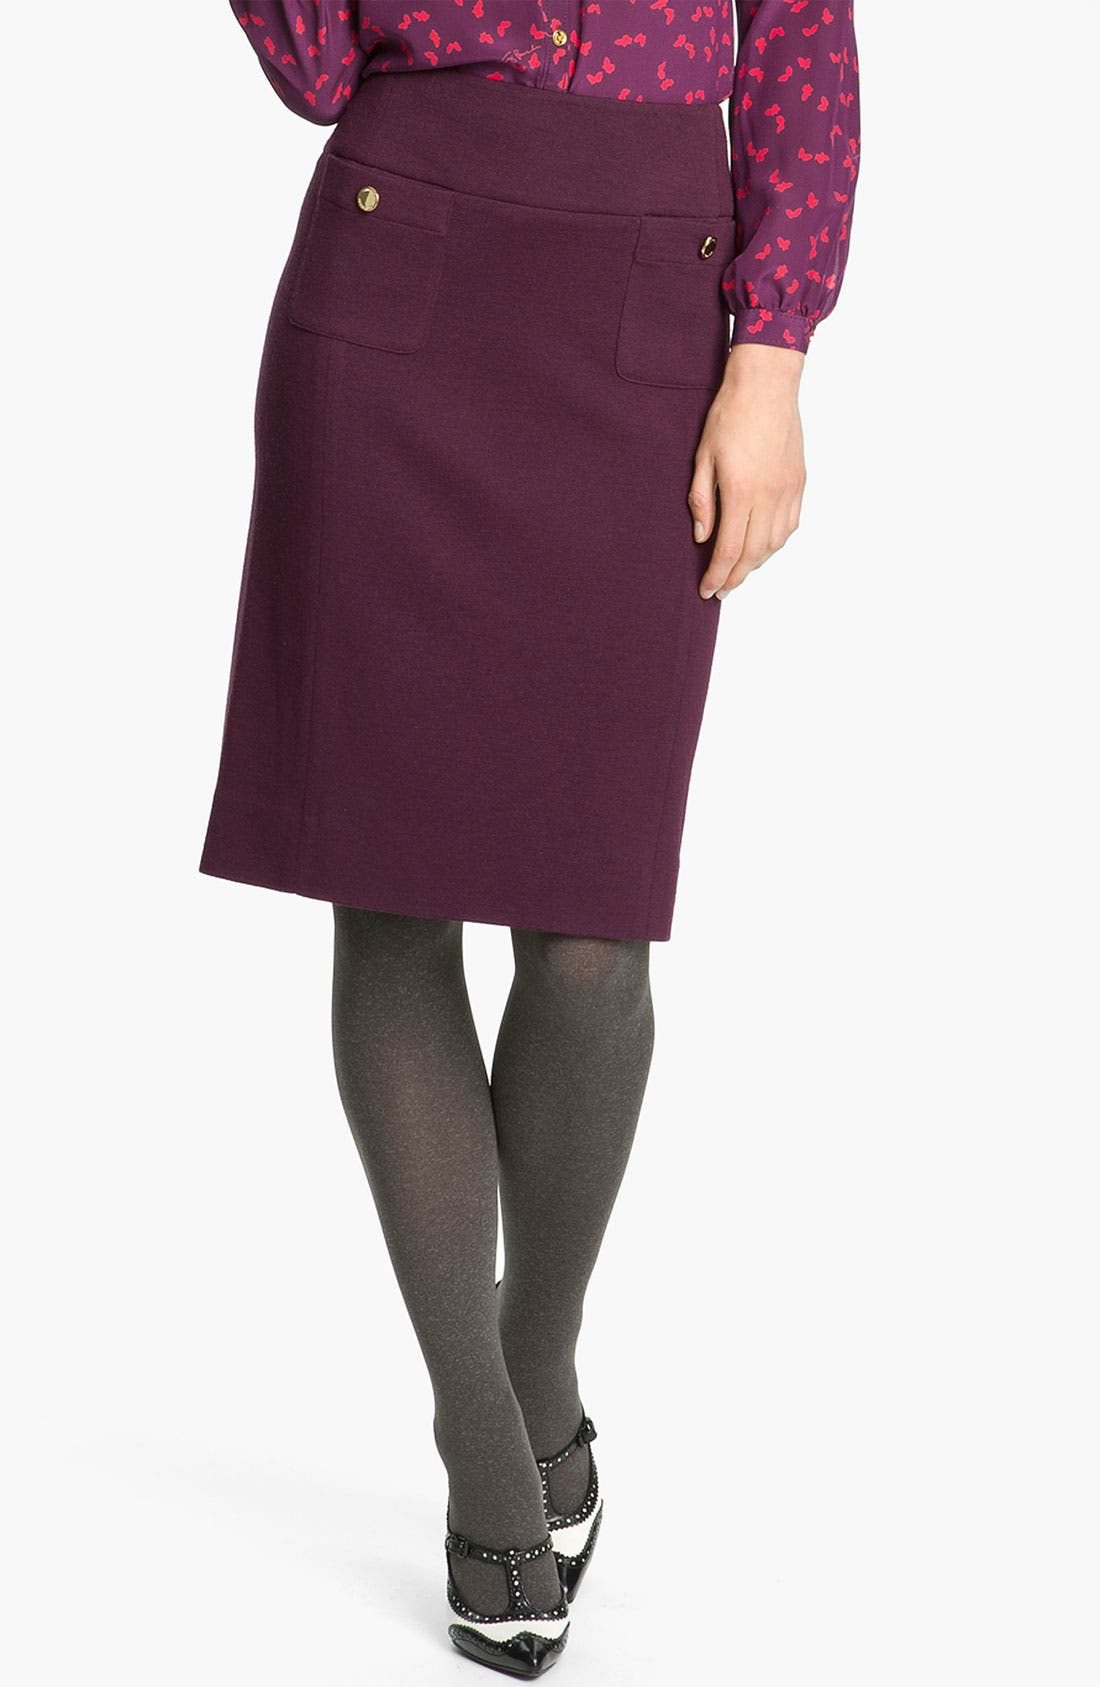 Main Image - Tory Burch 'Anthea' Pencil Skirt